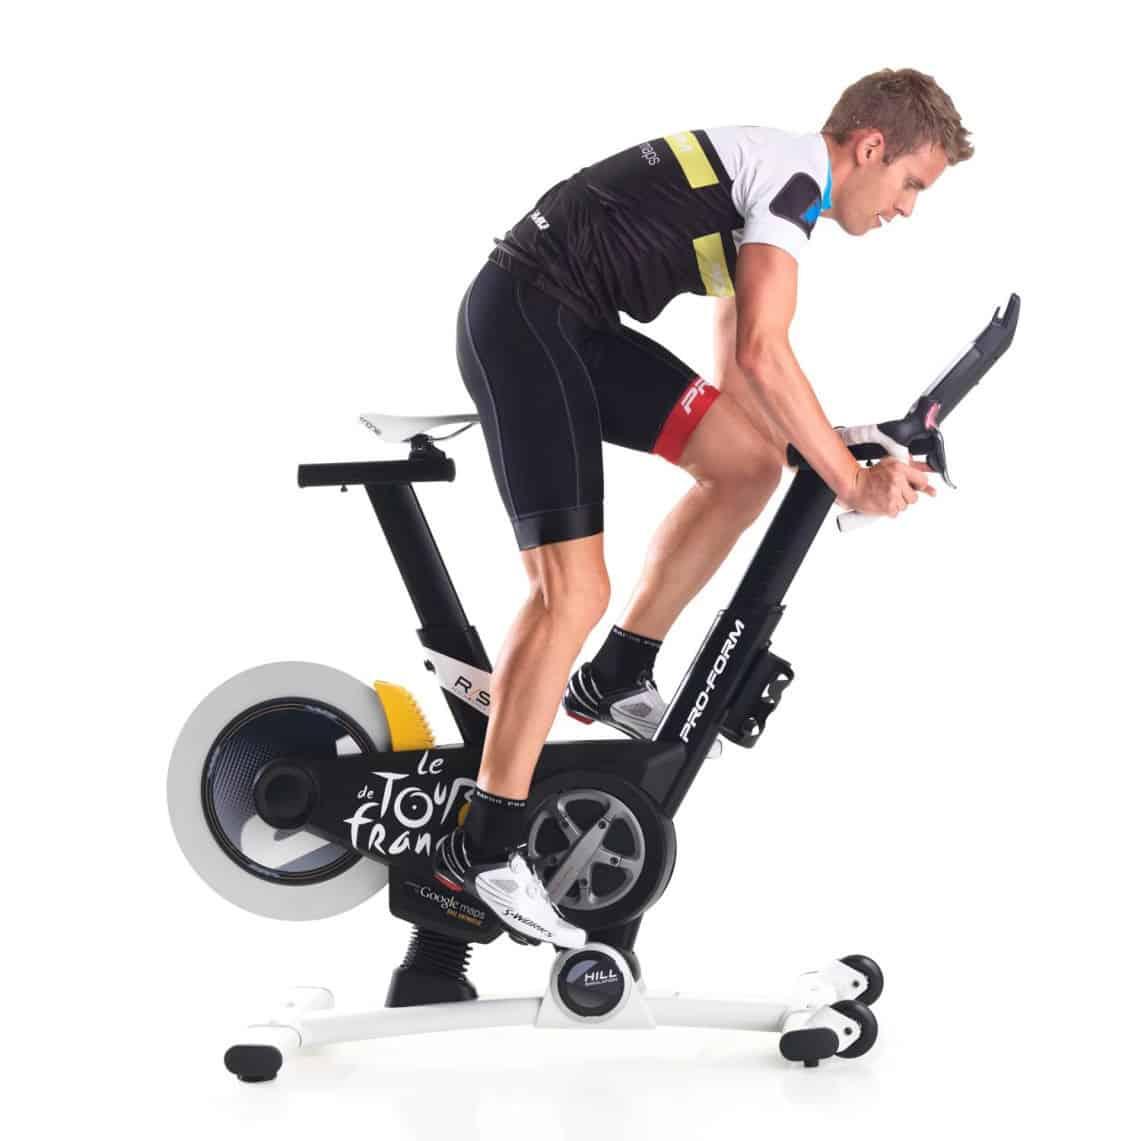 Спин-байк для велоаэробики